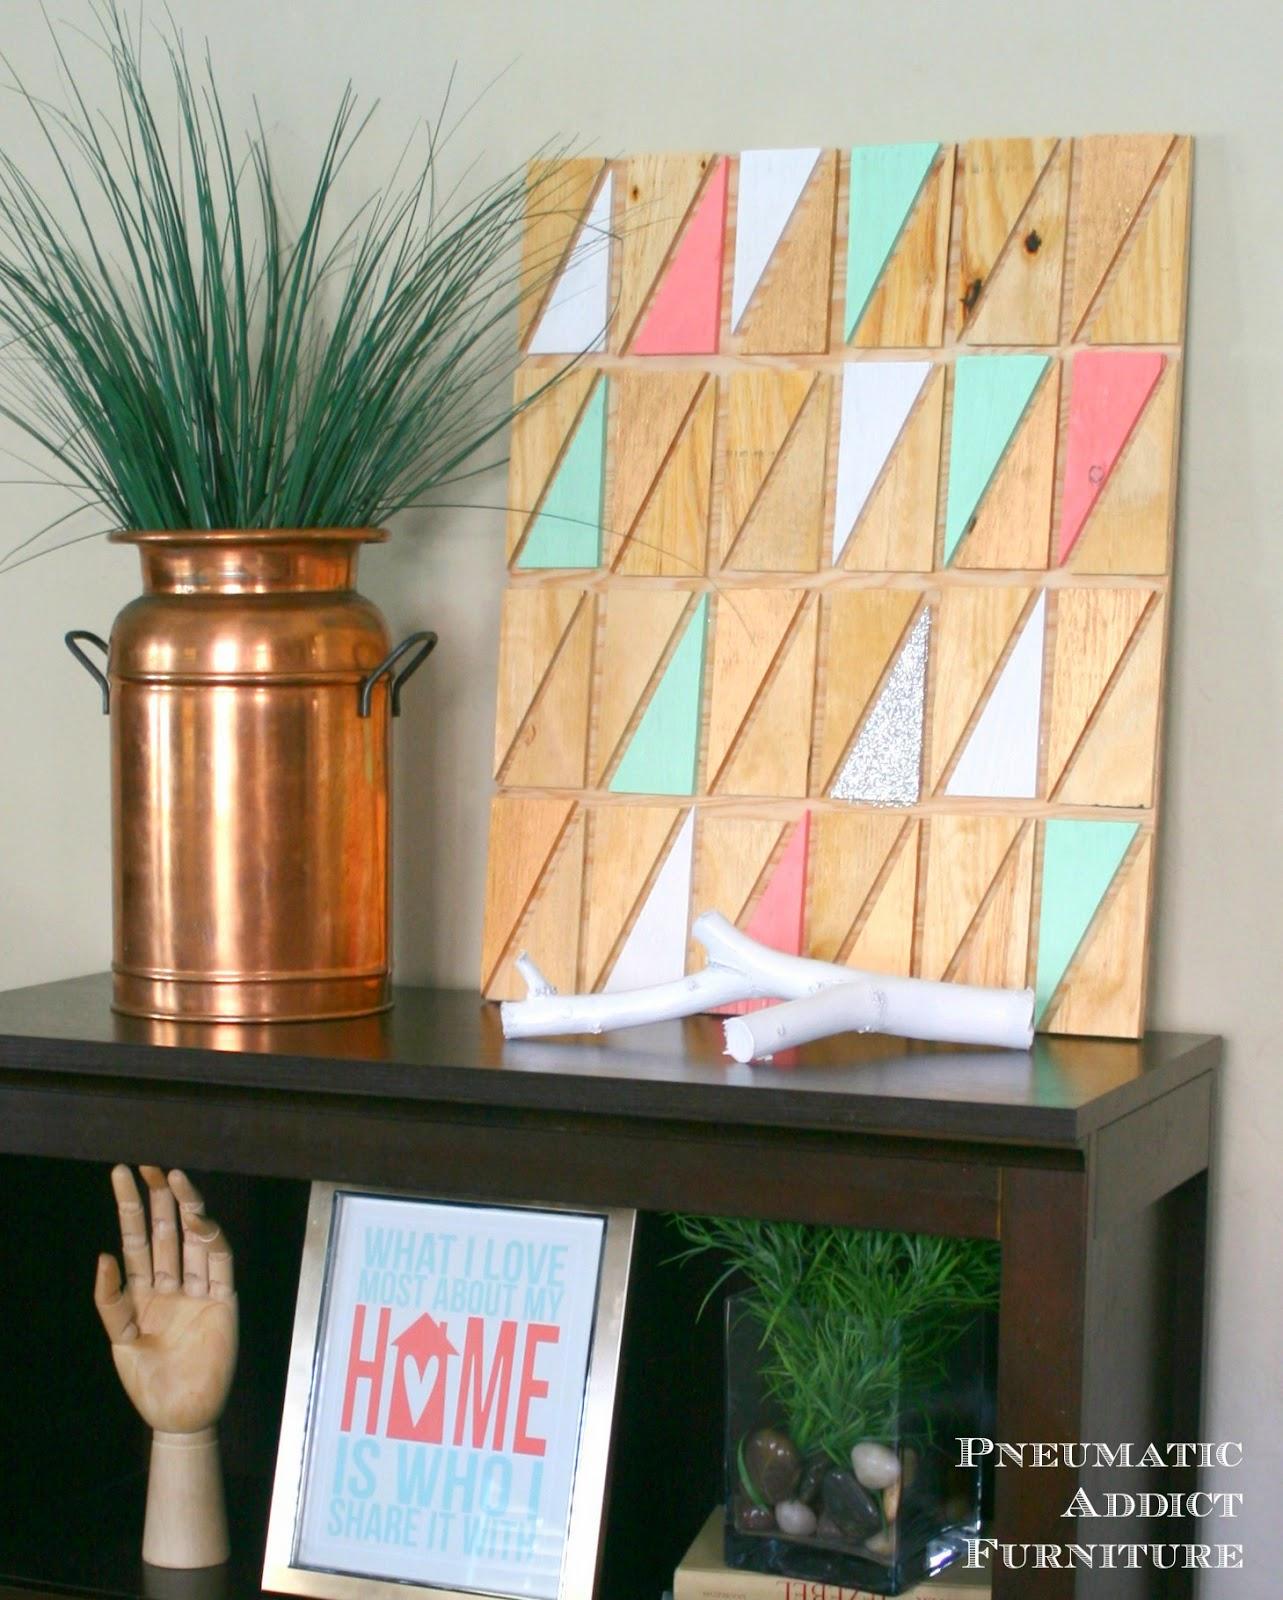 diy home decor ideas the 36th avenue. Black Bedroom Furniture Sets. Home Design Ideas